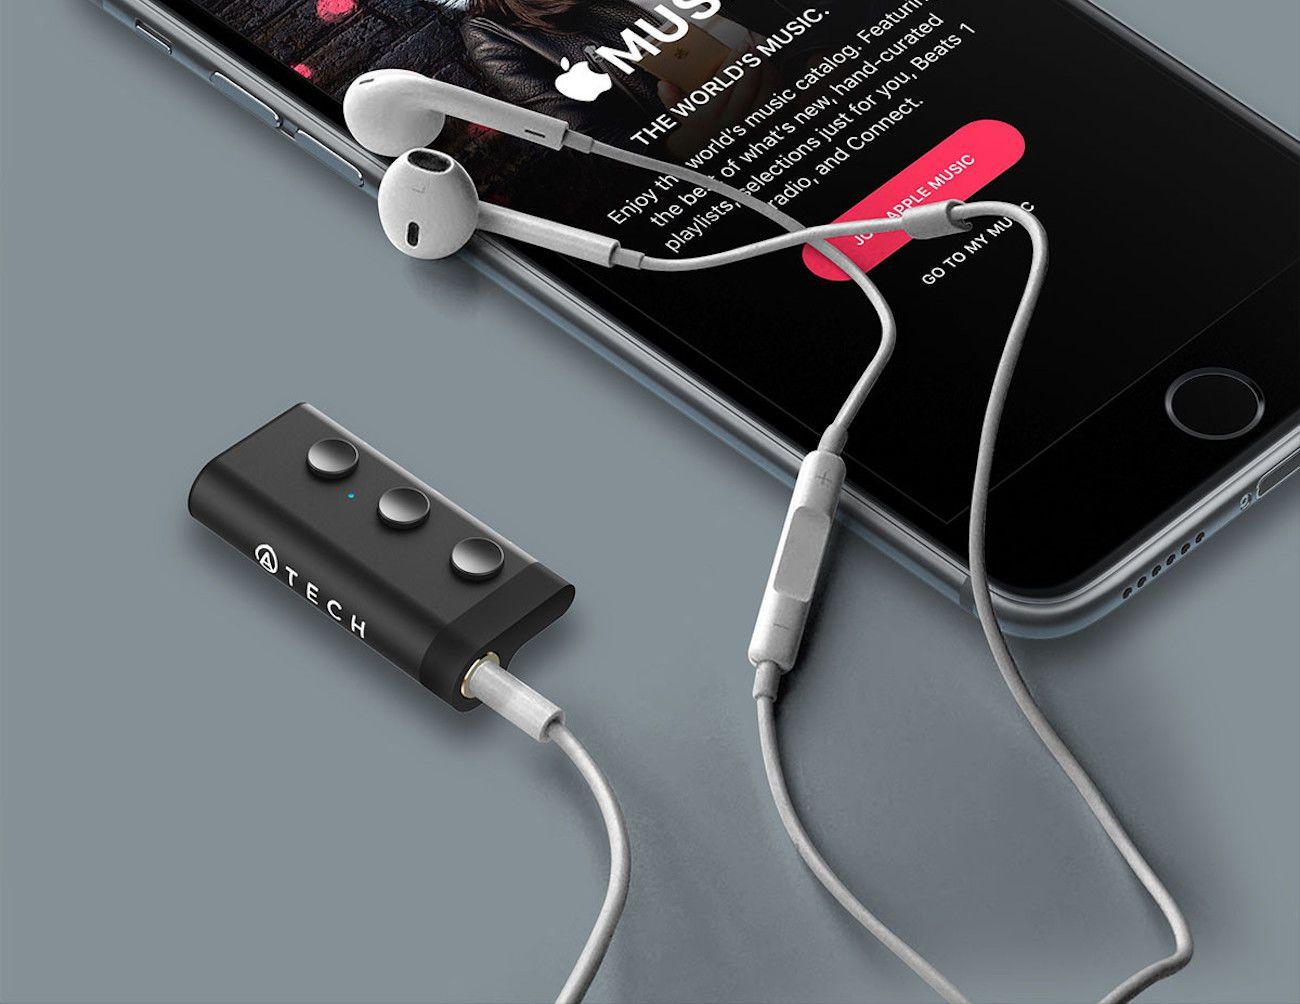 ATECH Micro Bluetooth Receiver